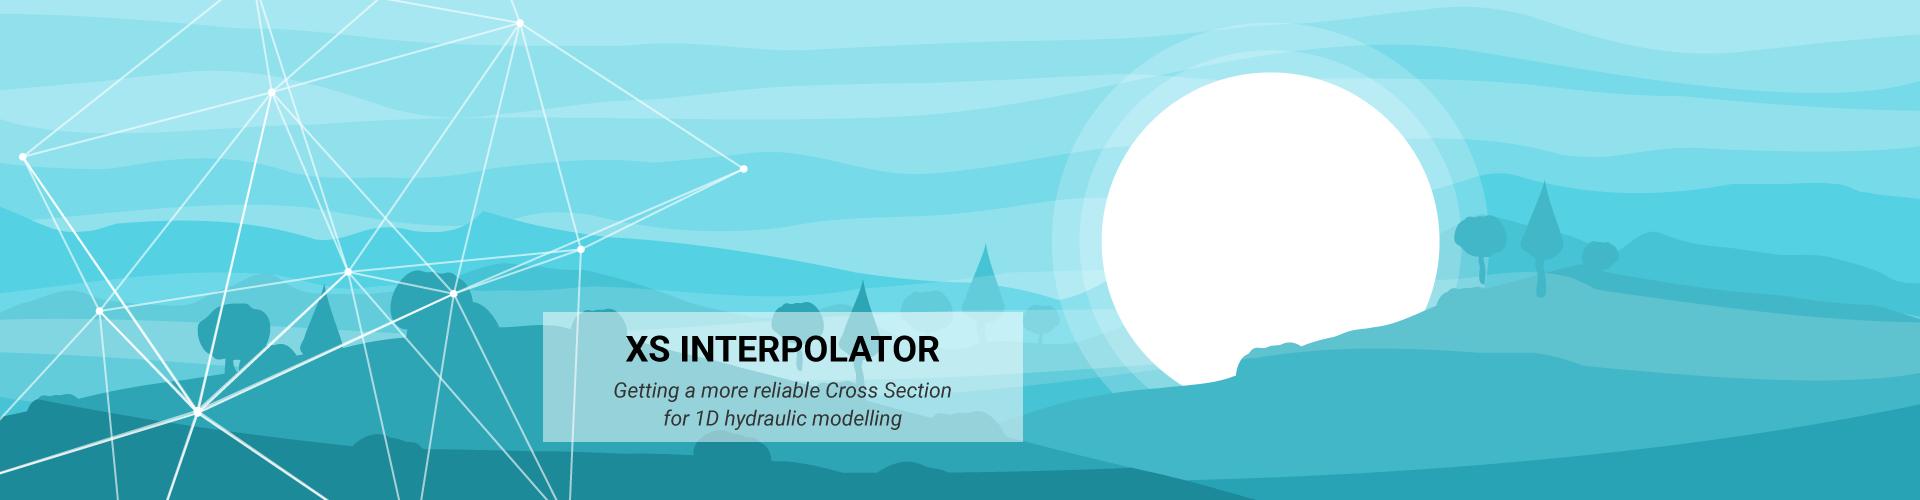 XS Interpolator